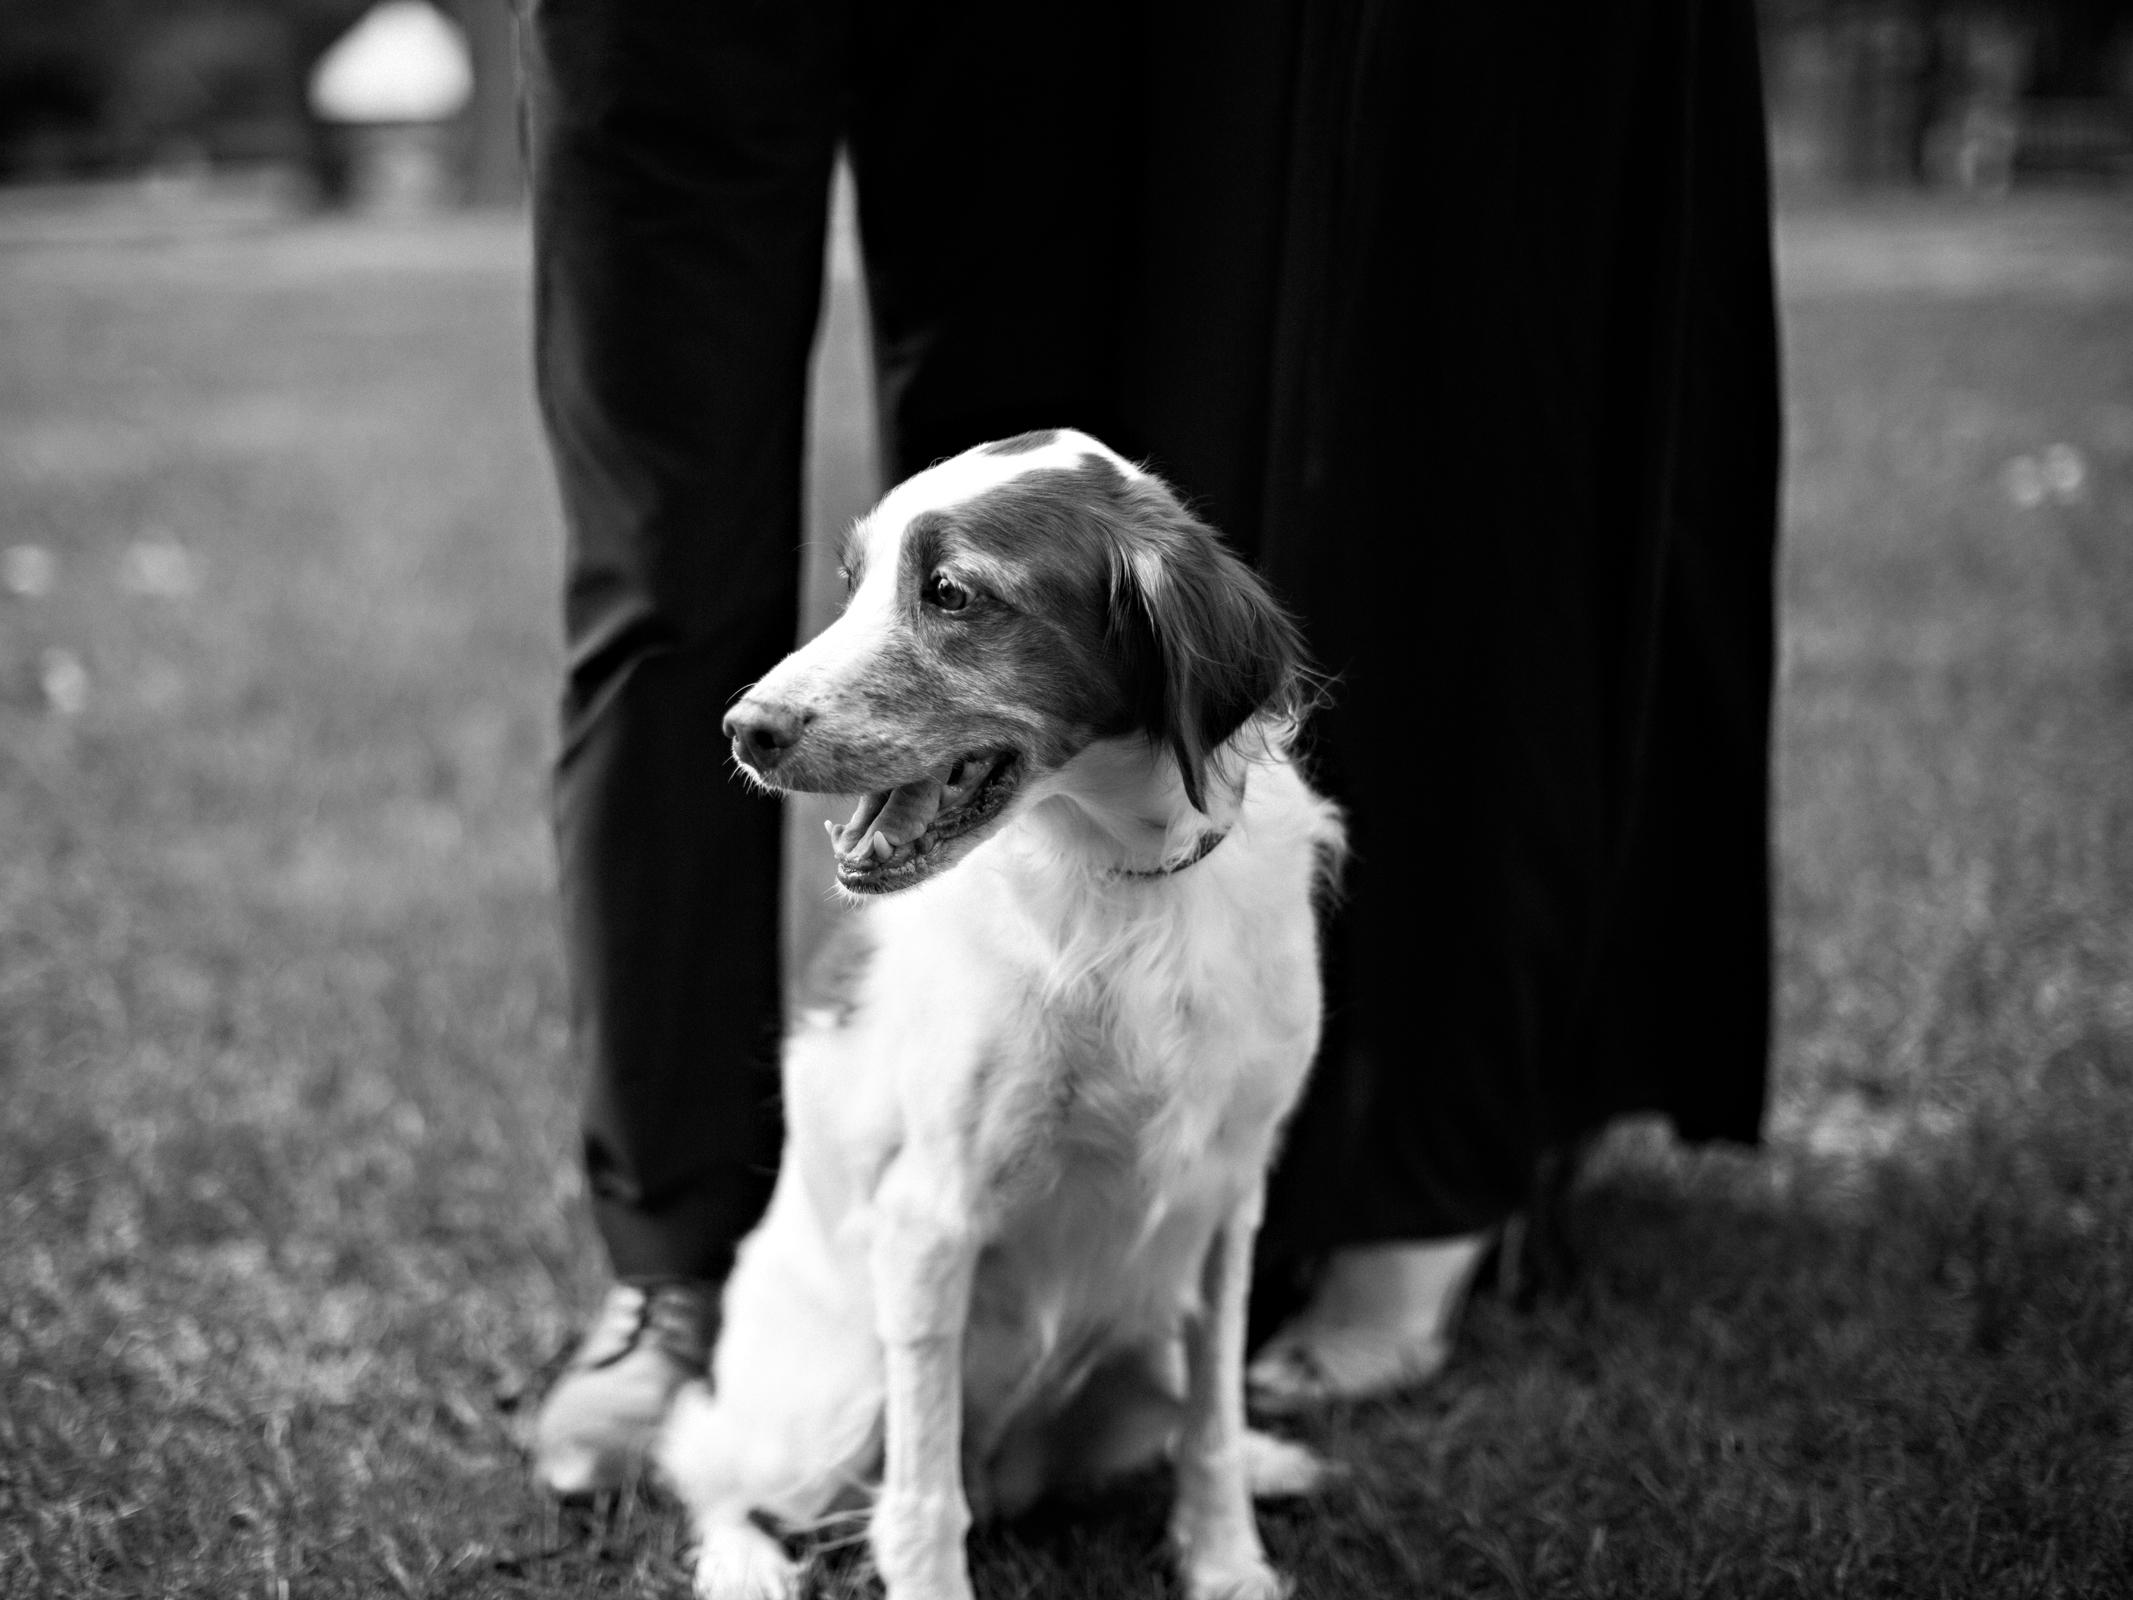 Nick-Drollette-Photography-Montgomery-Alabama-105.jpg